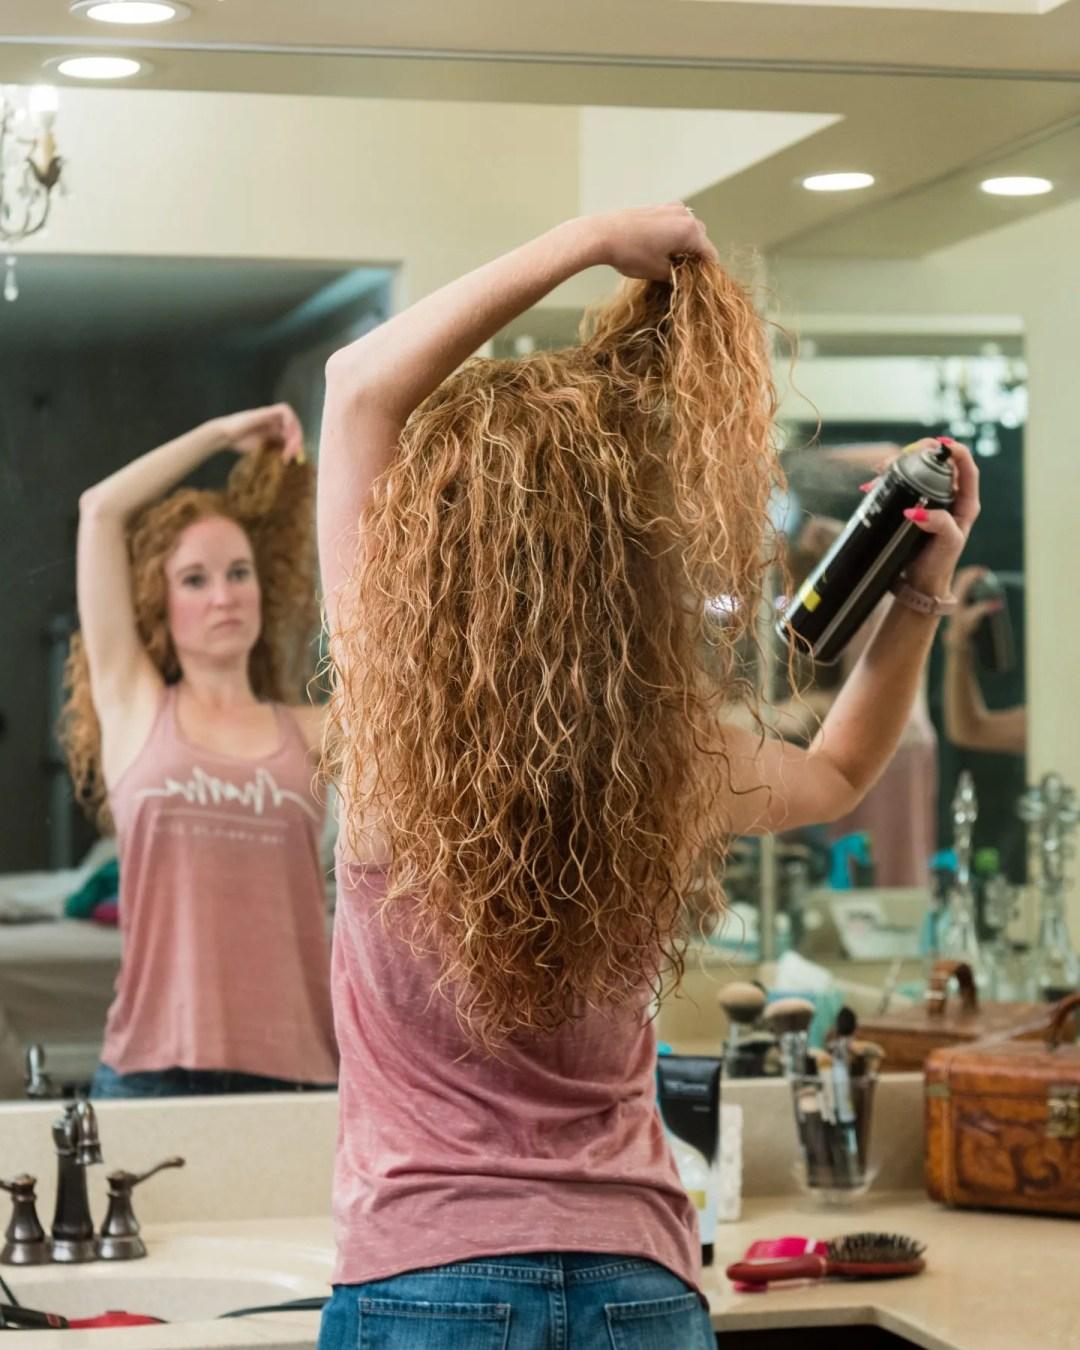 hairspray for curly hair